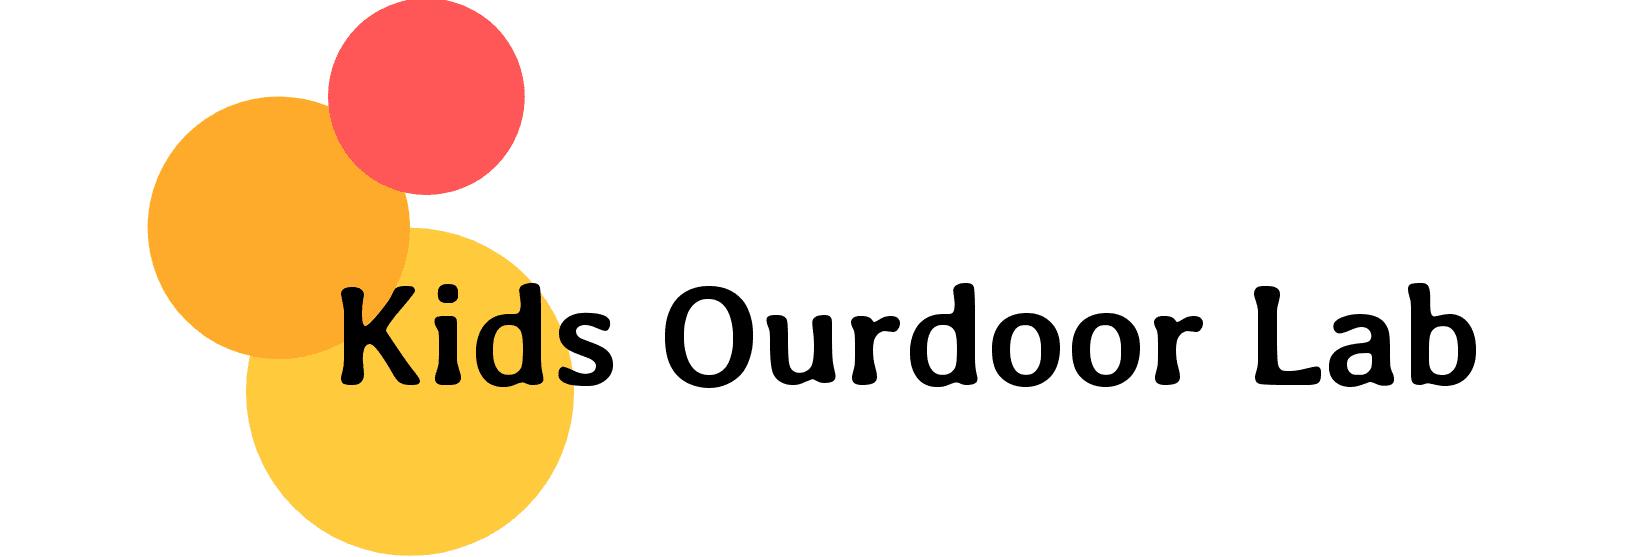 Kids Outdoor Lab